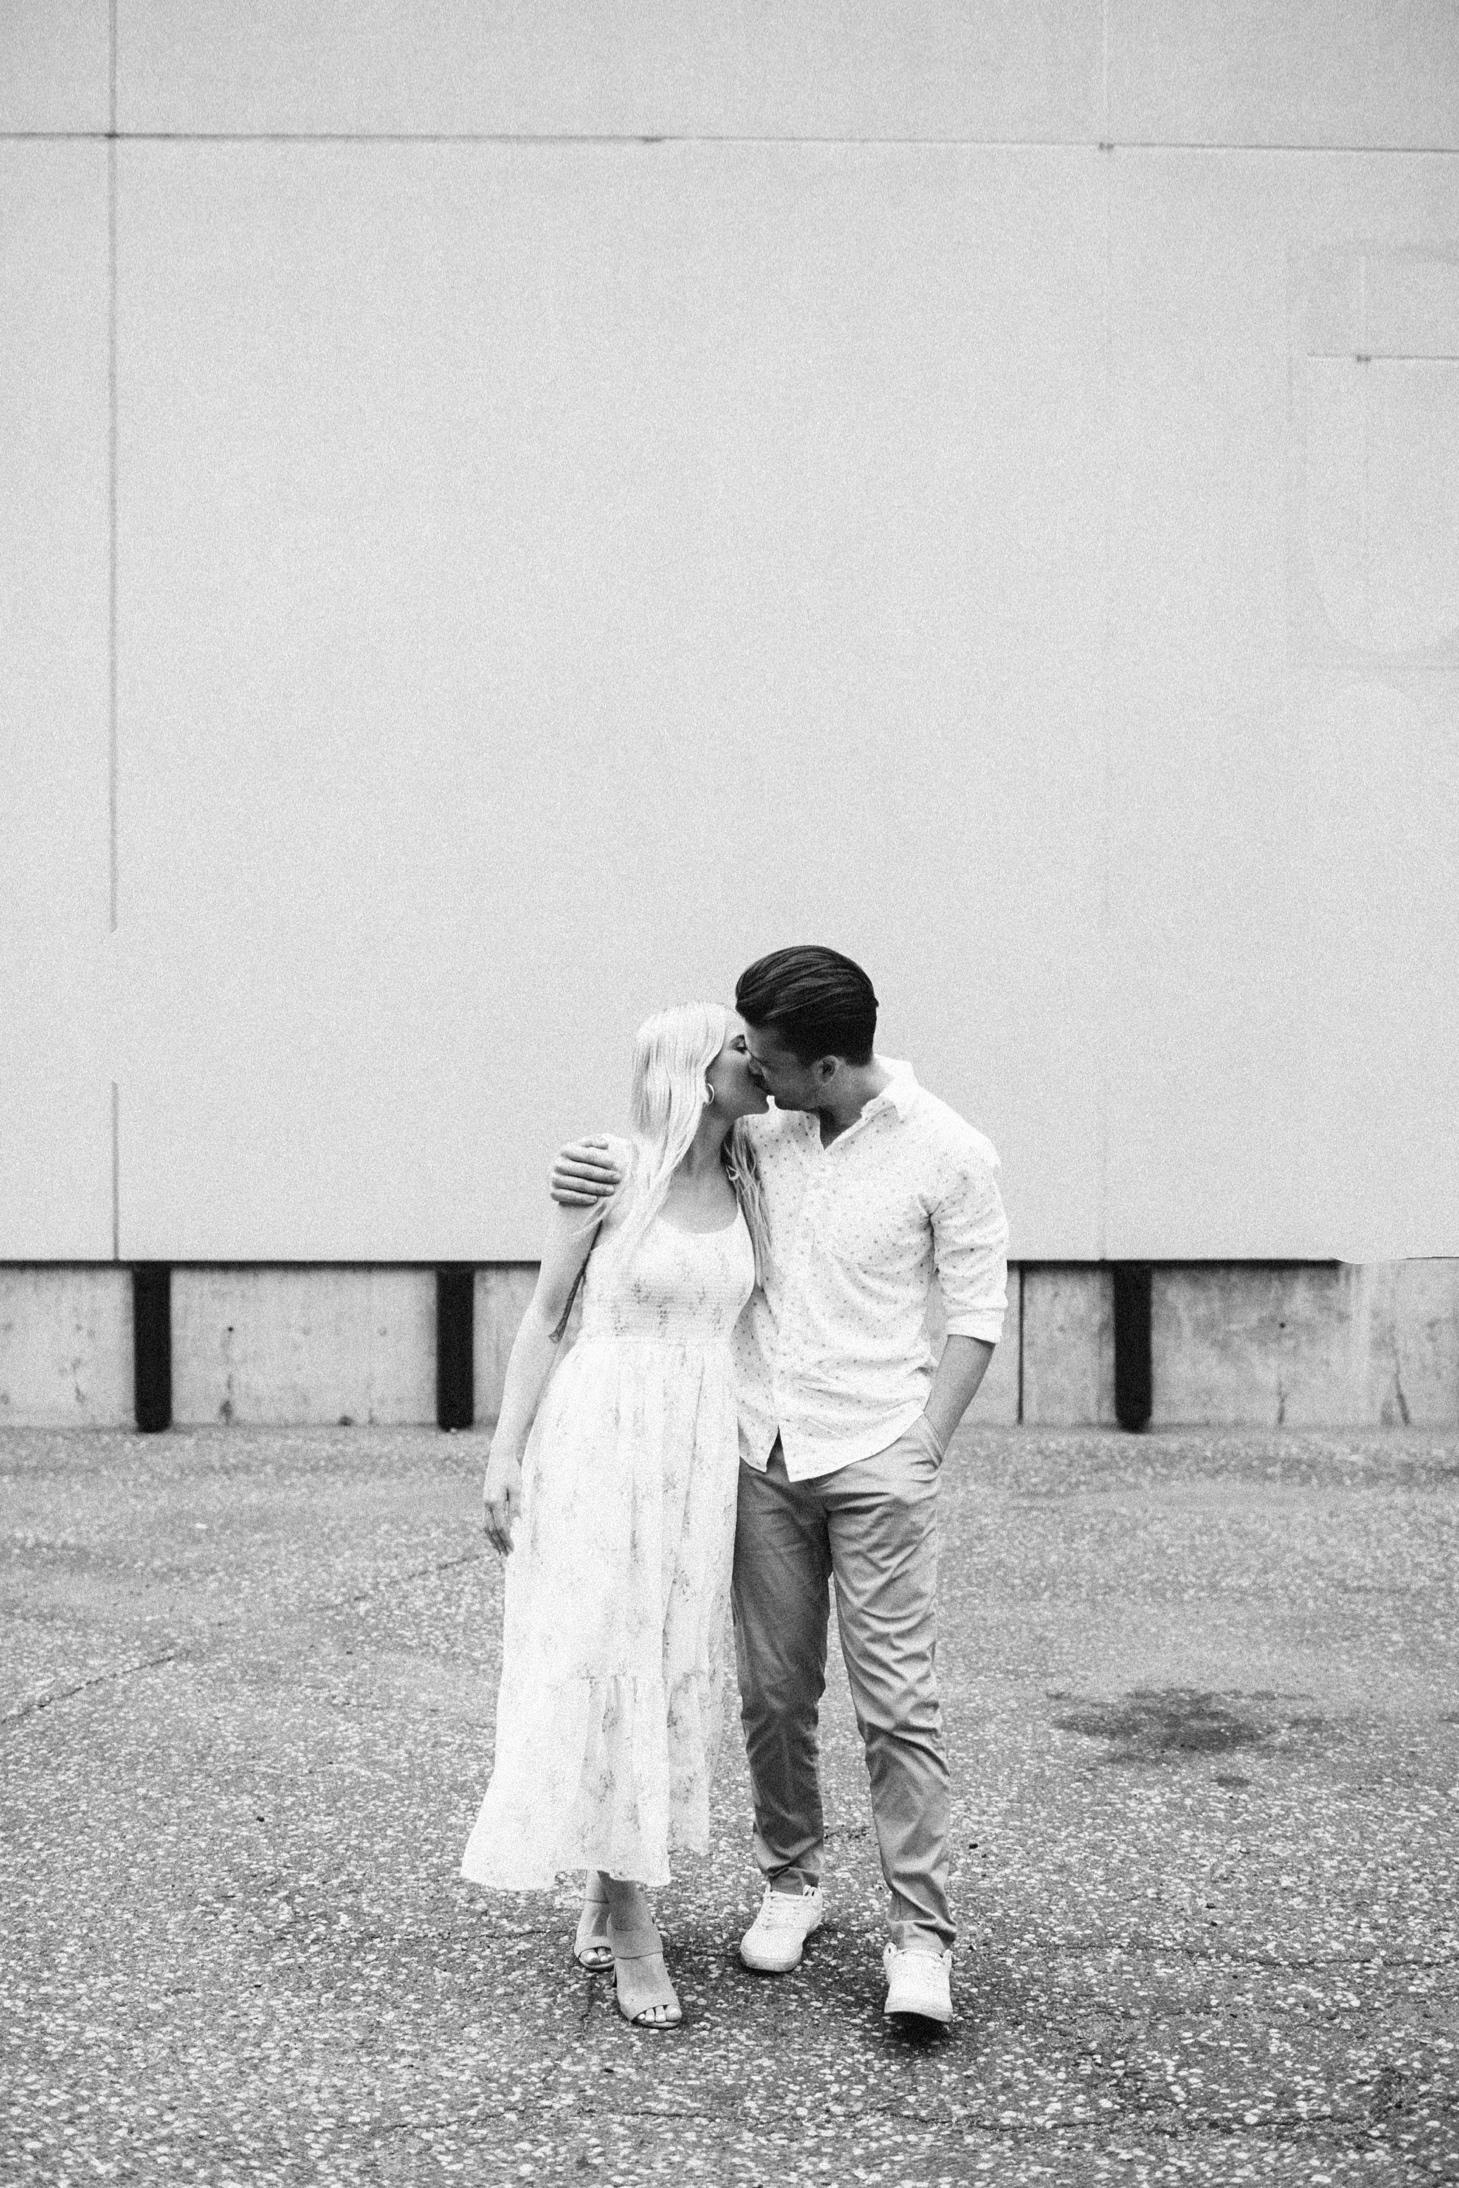 13_engagements-51_urbanphotography_stpaulphotos,_mnweddingphotographer,_kileymarissaphotography,_stpaulengagement,_stpaulminnesota_kileymarissa,_mnengagementphotos,.jpg